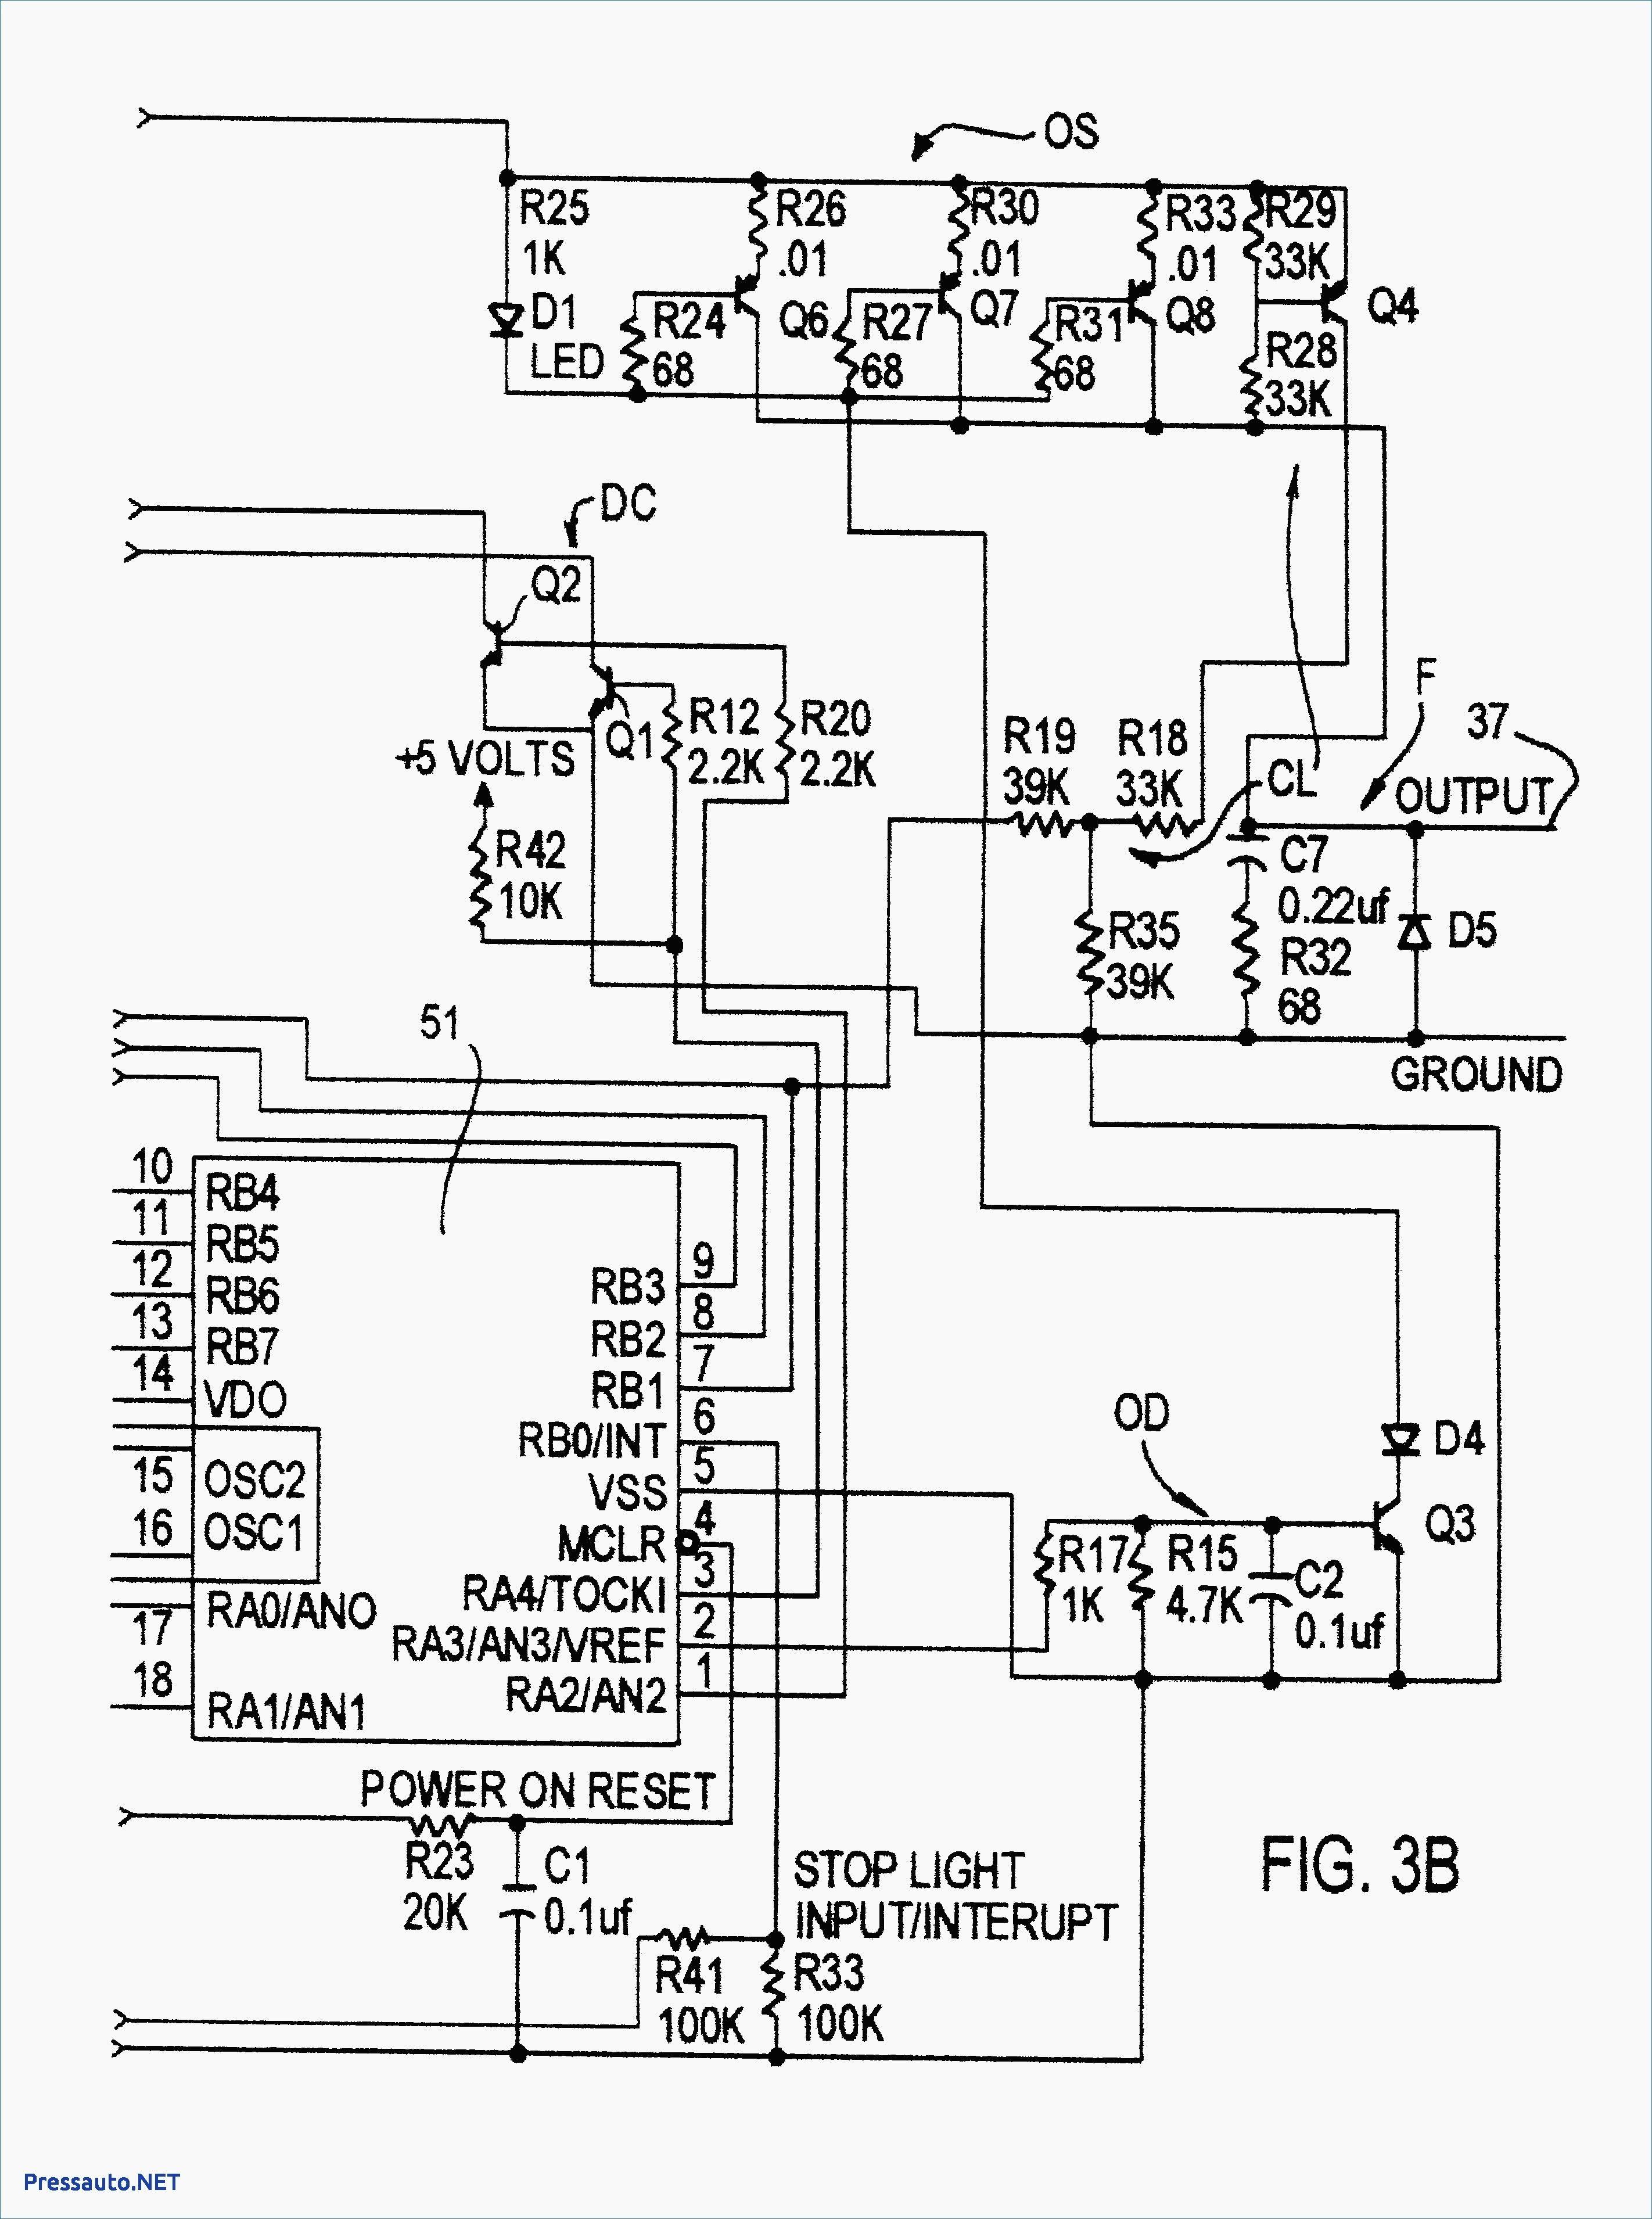 2001 S10 Tail Light Wiring Diagram Trailer Wiring Diagram Diagram Electrical Diagram